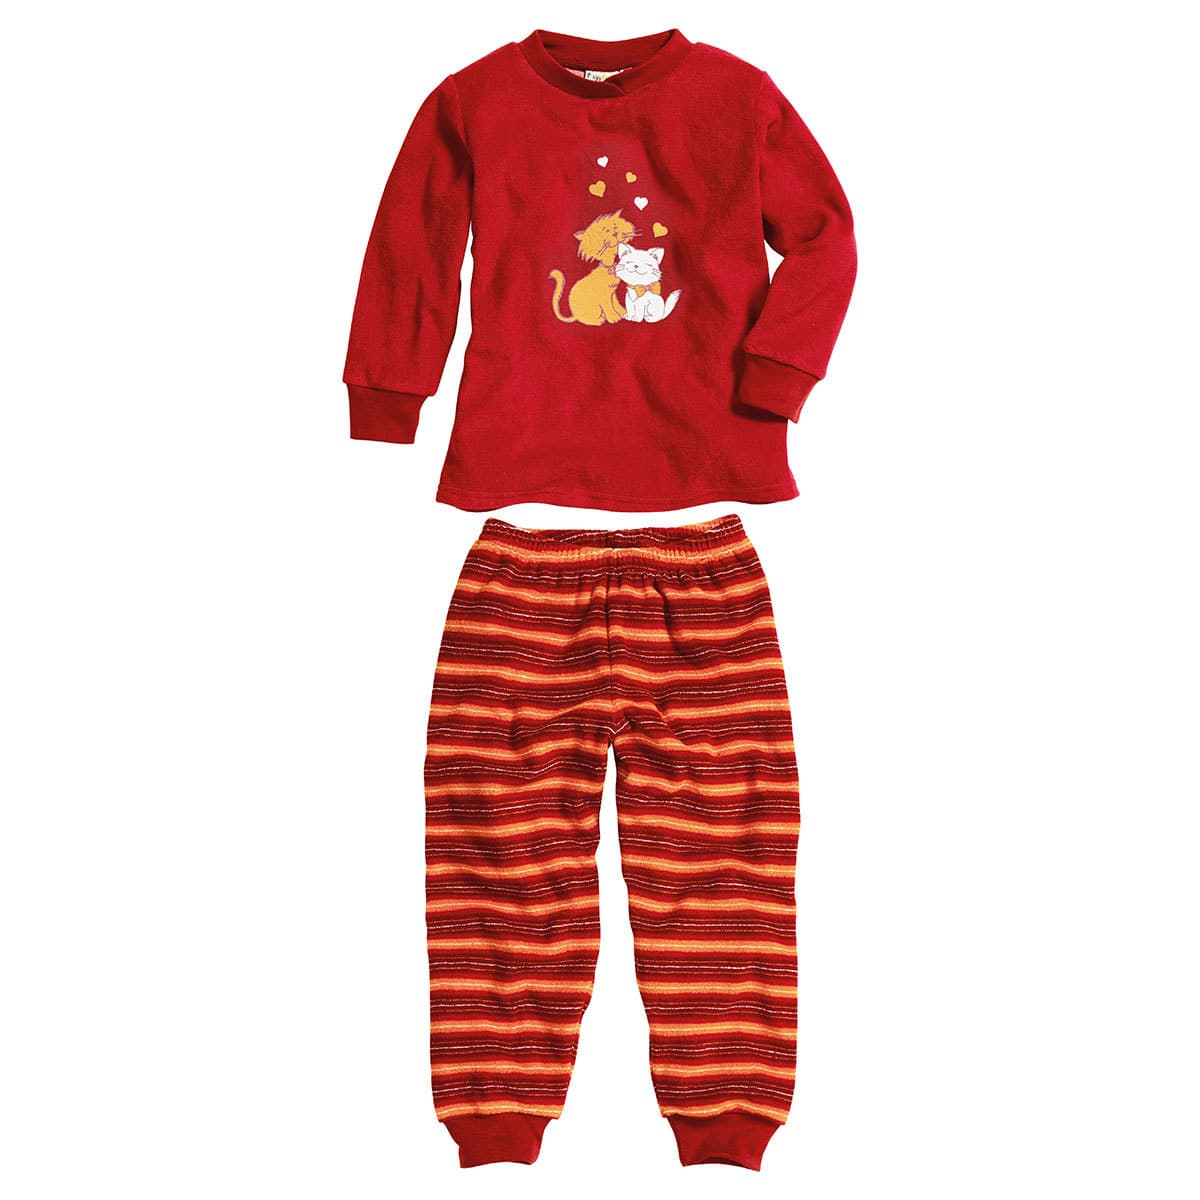 fbc87d33892252 Playshoes Kinder Frottee Schlafanzug Katzen rot günstig online ...